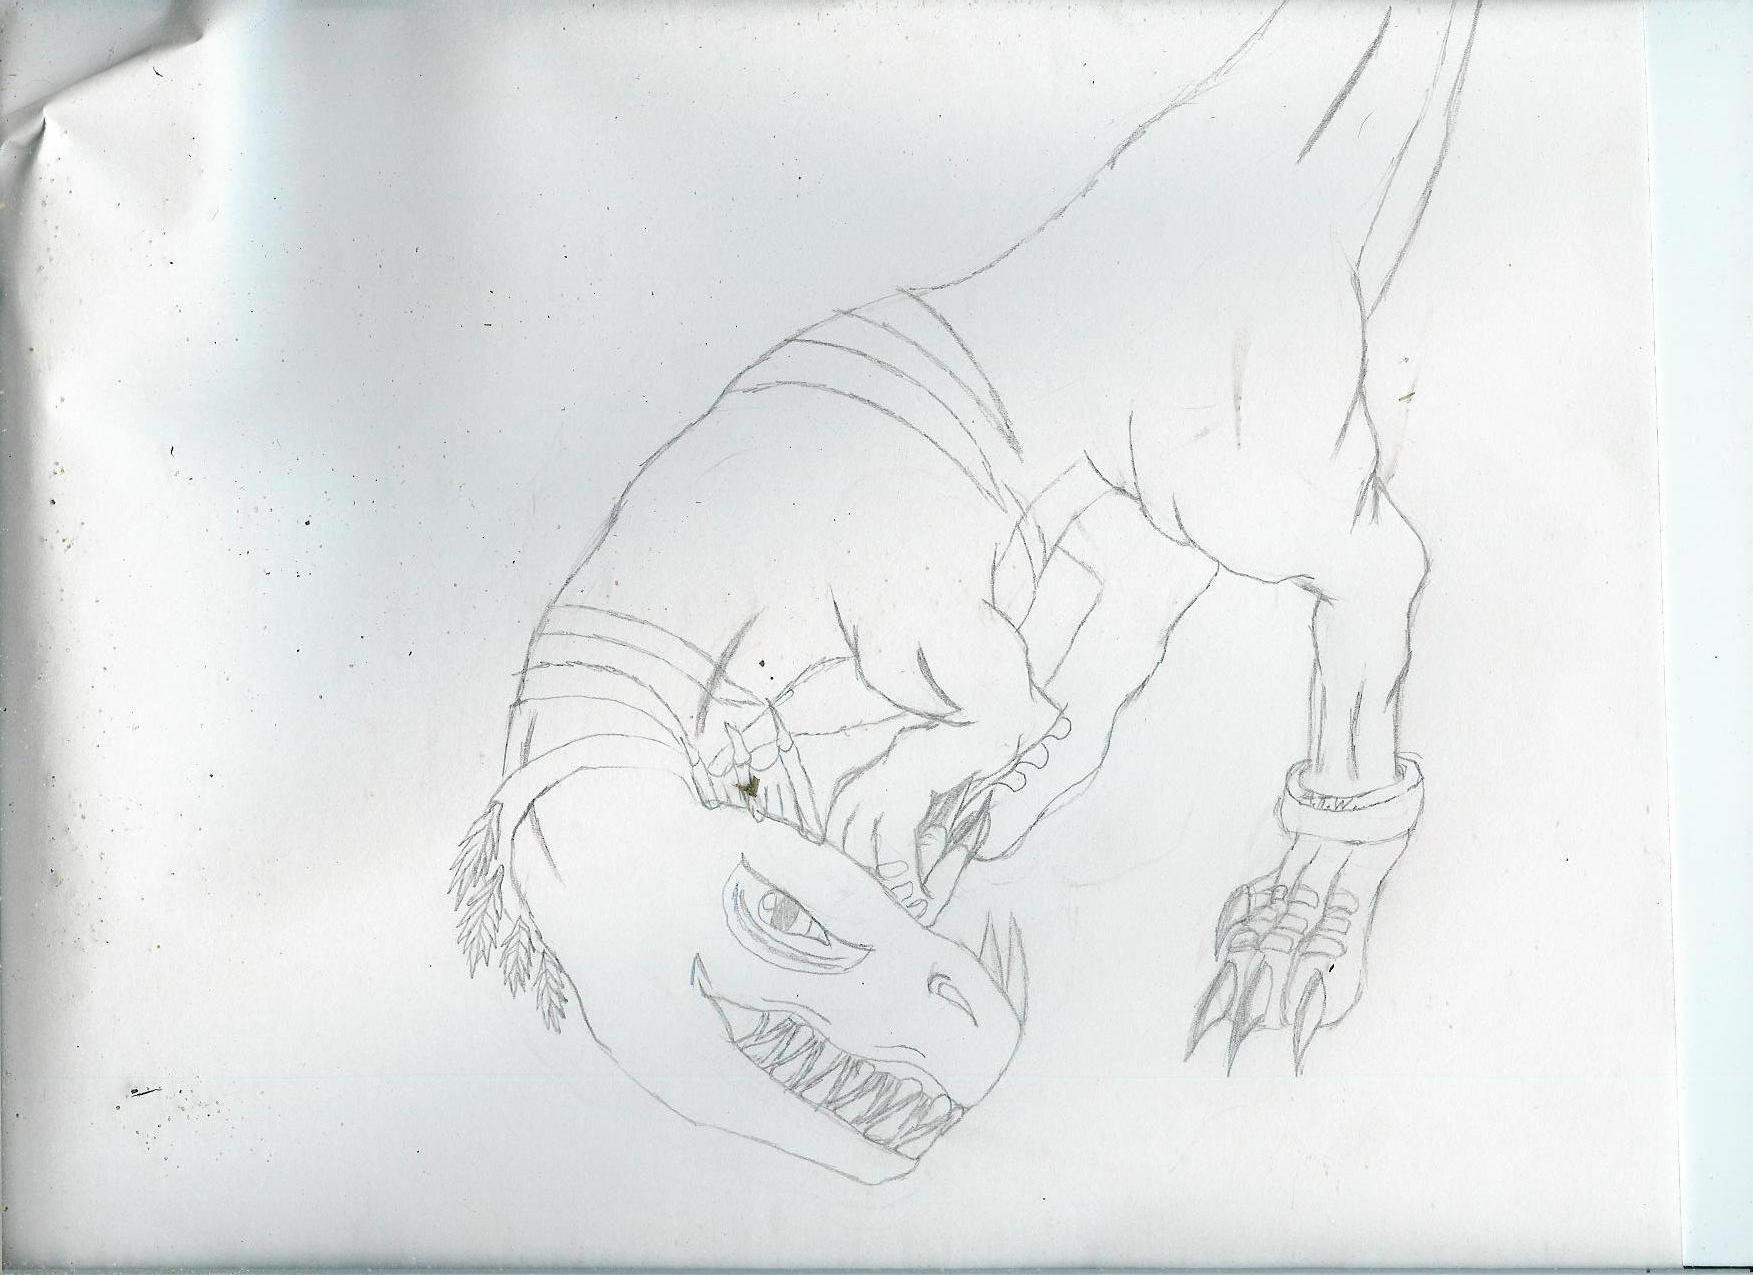 raptors(request from freddyjasonV) by AlphaTimberWulf